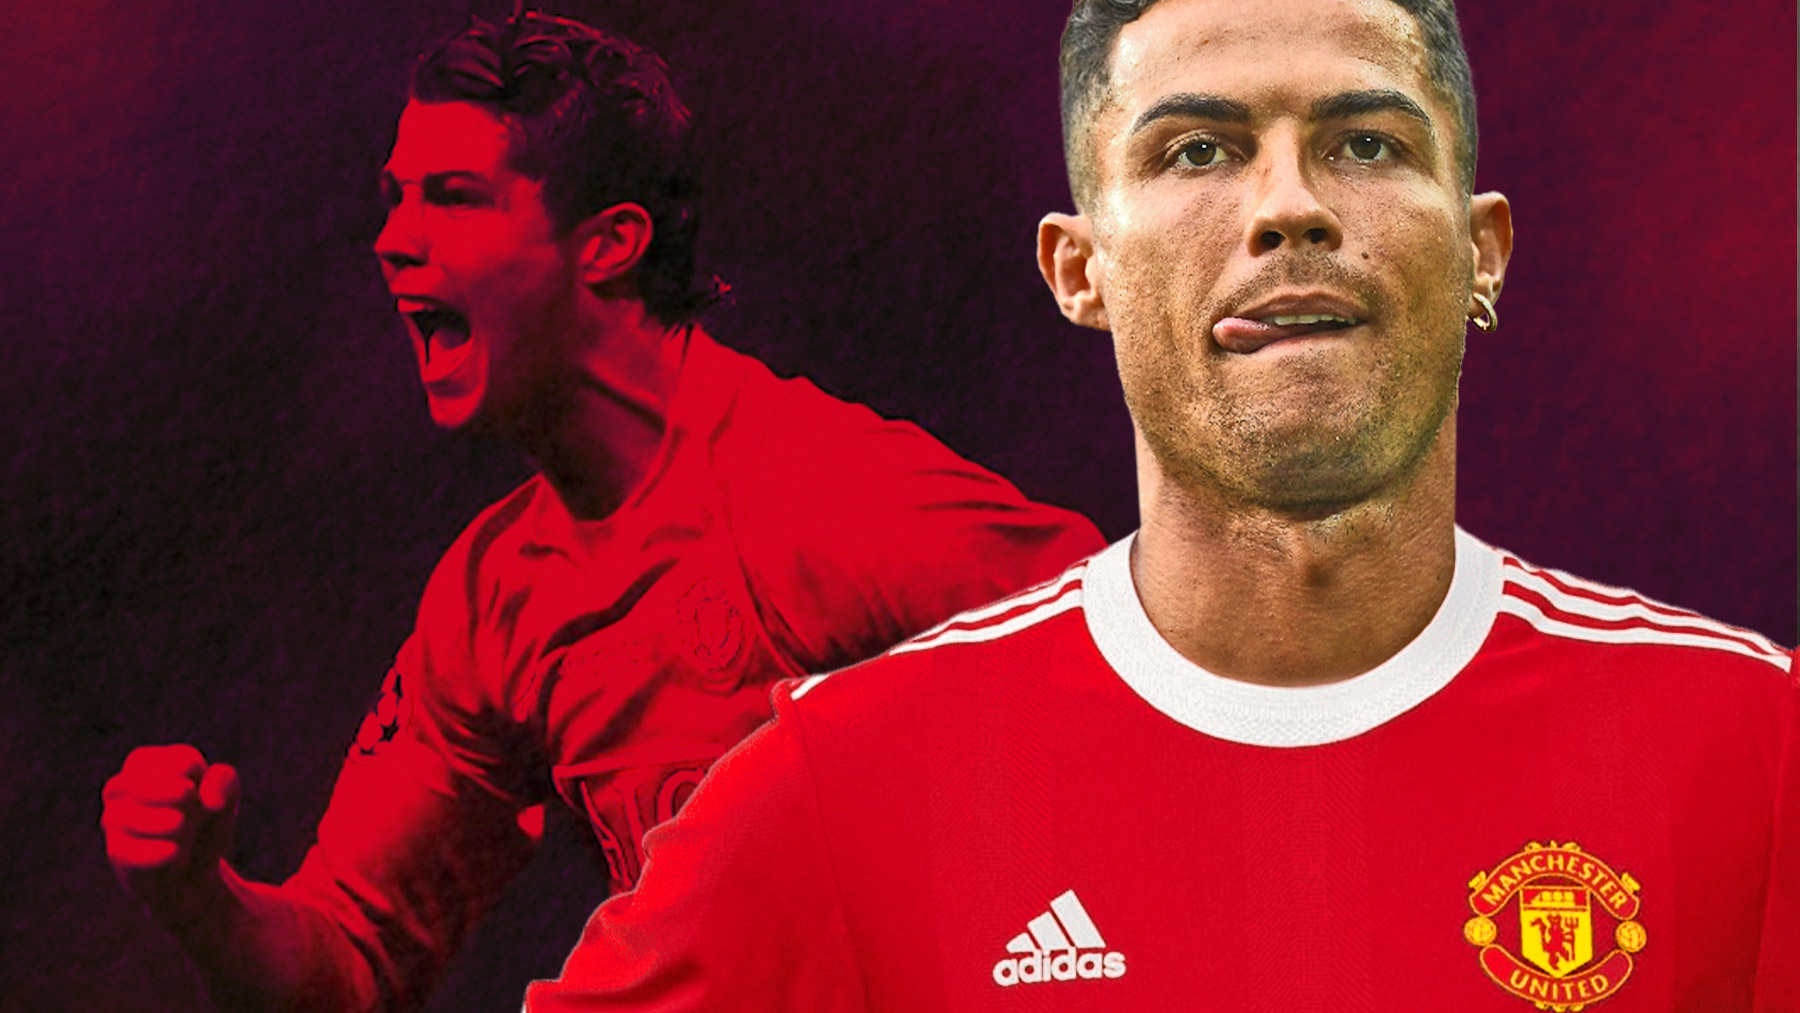 Cristiano Ronaldo vuelve al lugar donde fue profeta.